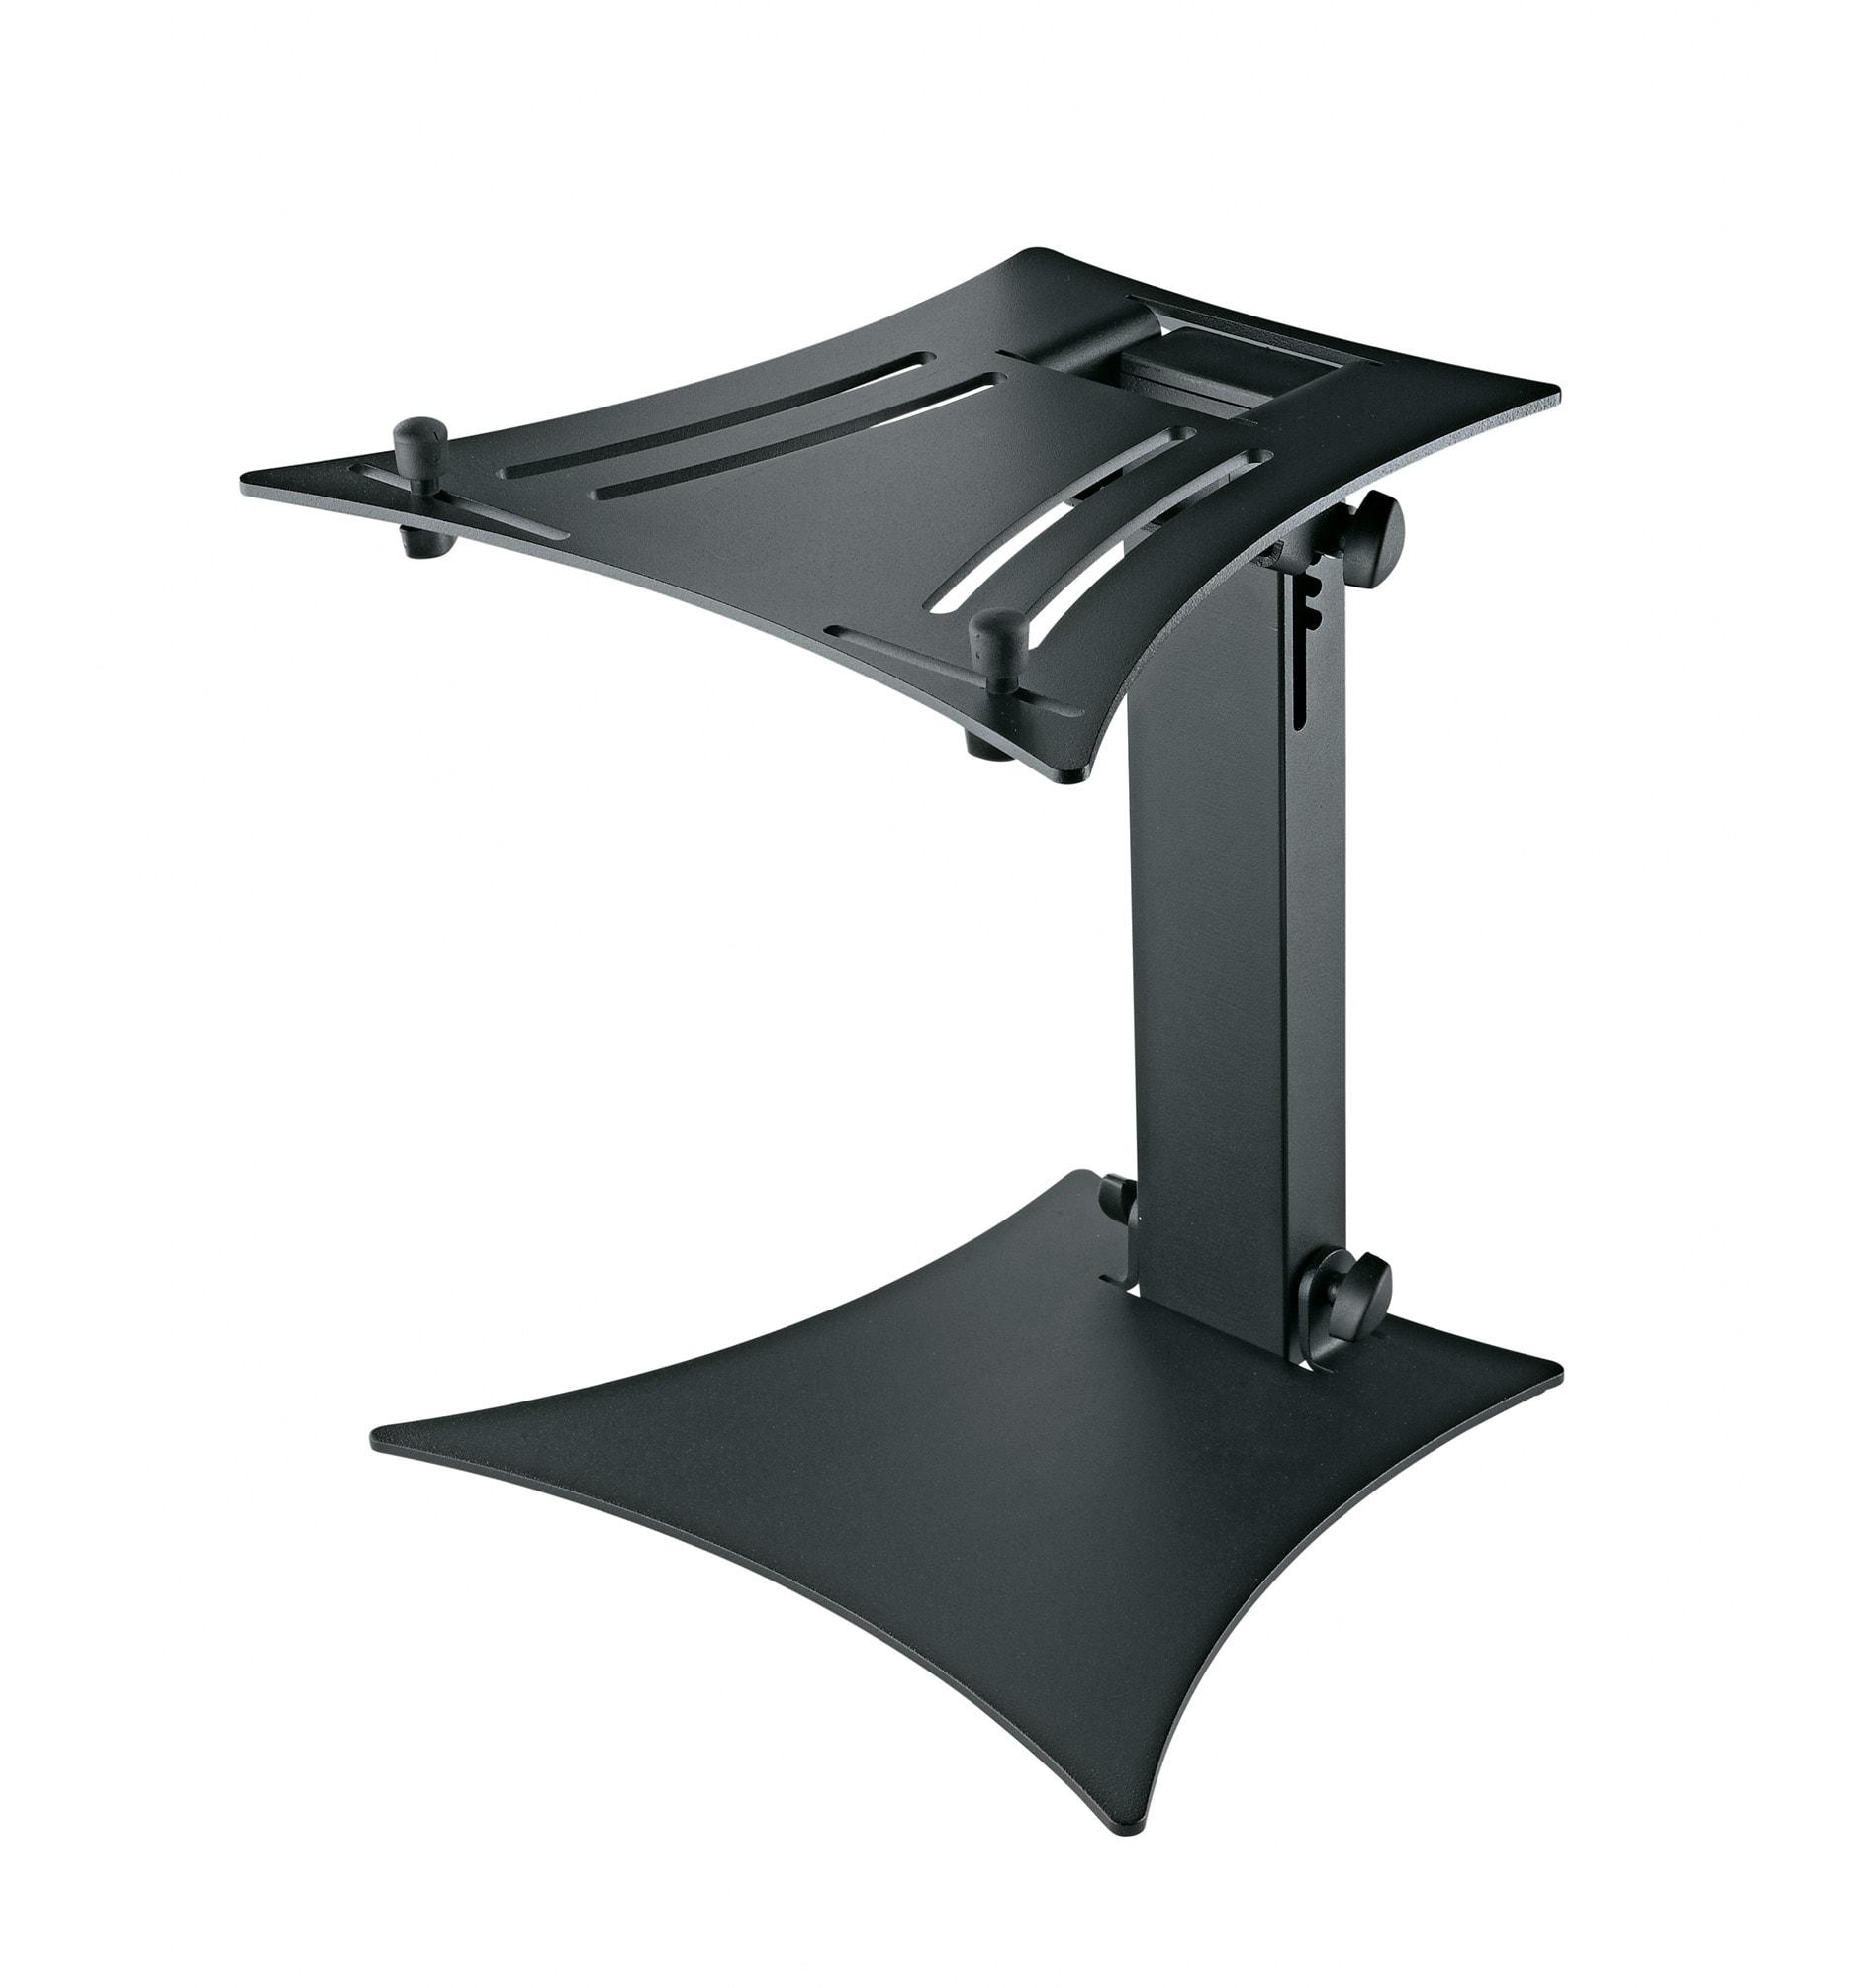 KM12190 - Laptop stand